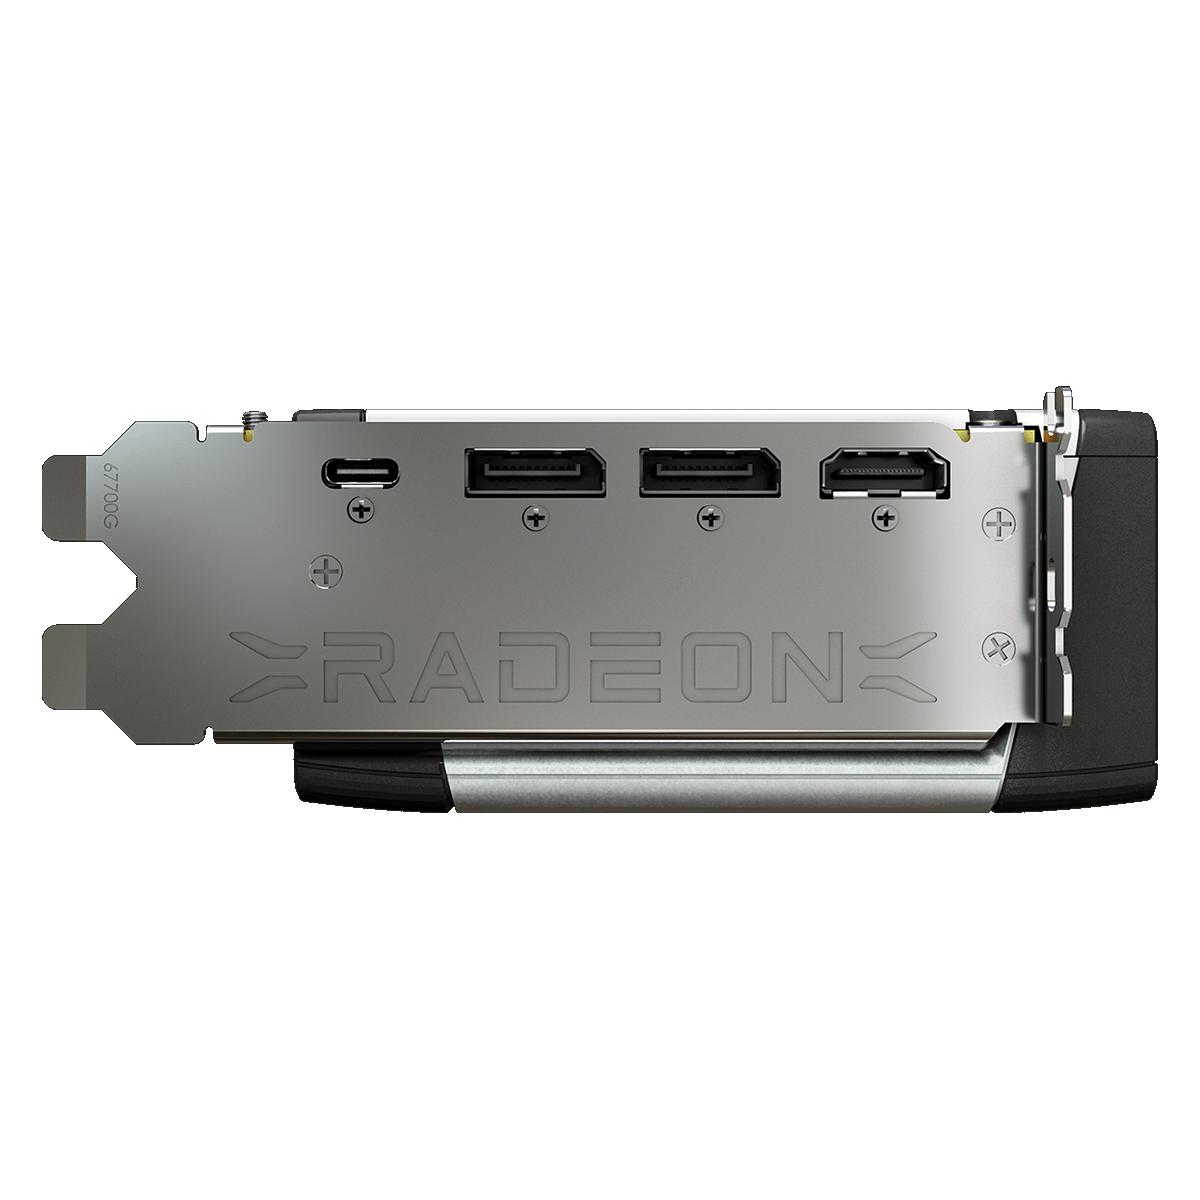 Placa de Vídeo MSI Radeon RX 6800 XT, 16GB, GDDR6. 256 Bit